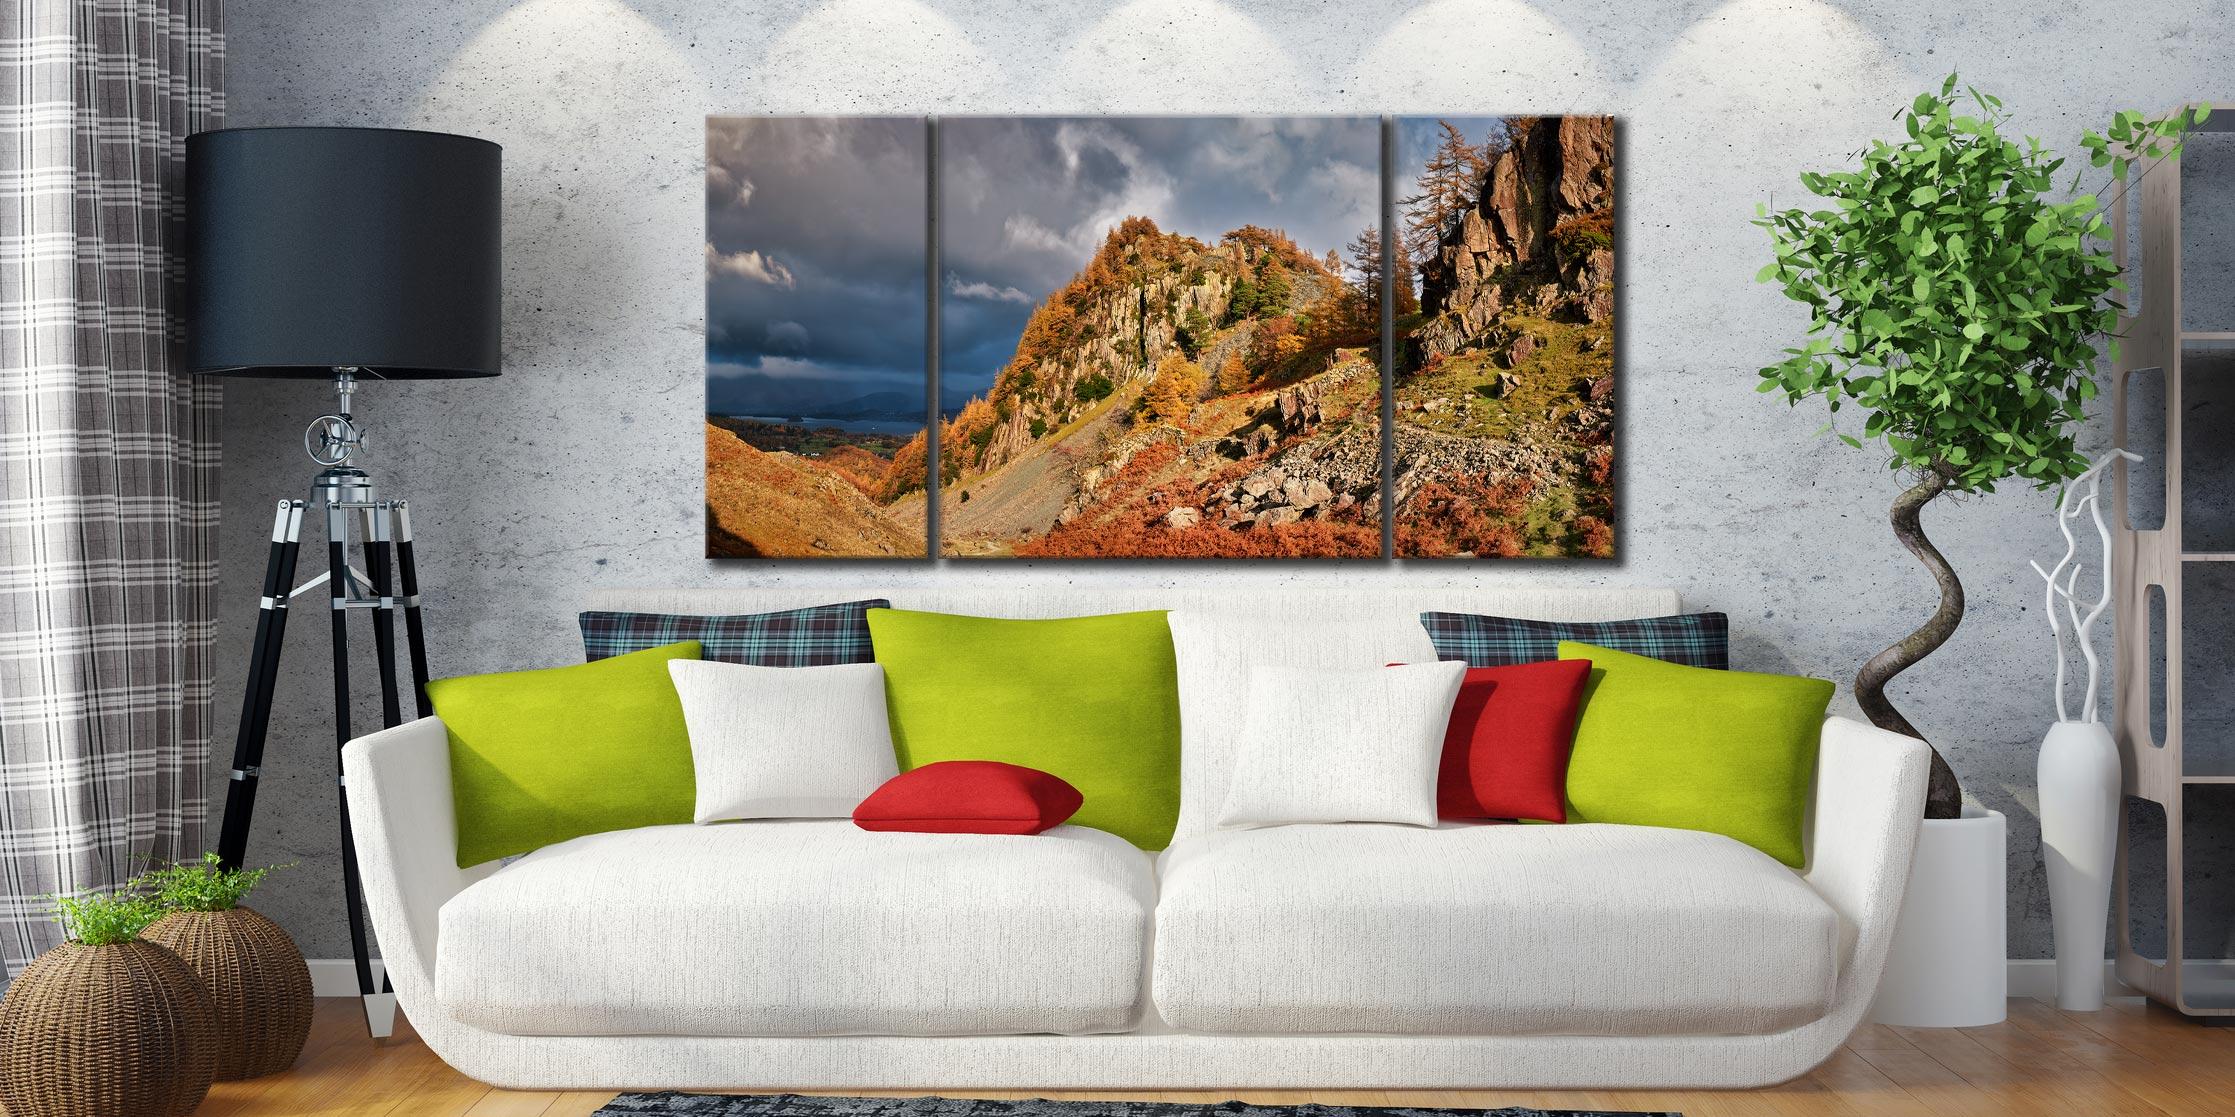 Castle Crag Autumn Sunshine - 3 Panel Wide Centre Canvas on Wall